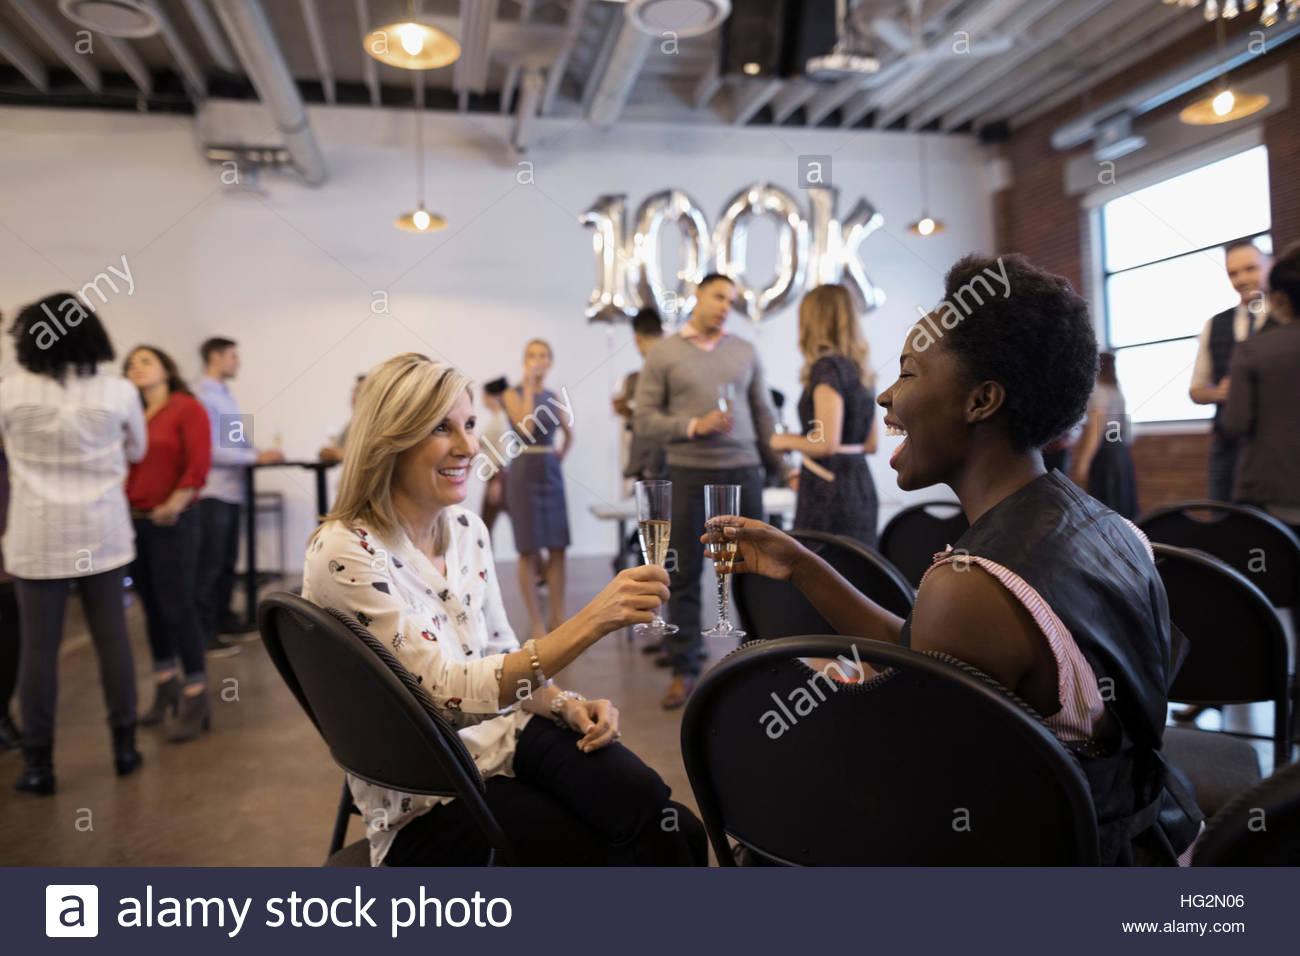 Businesswomen networking and celebrating milestone toasting champagne flutes - Stock Image